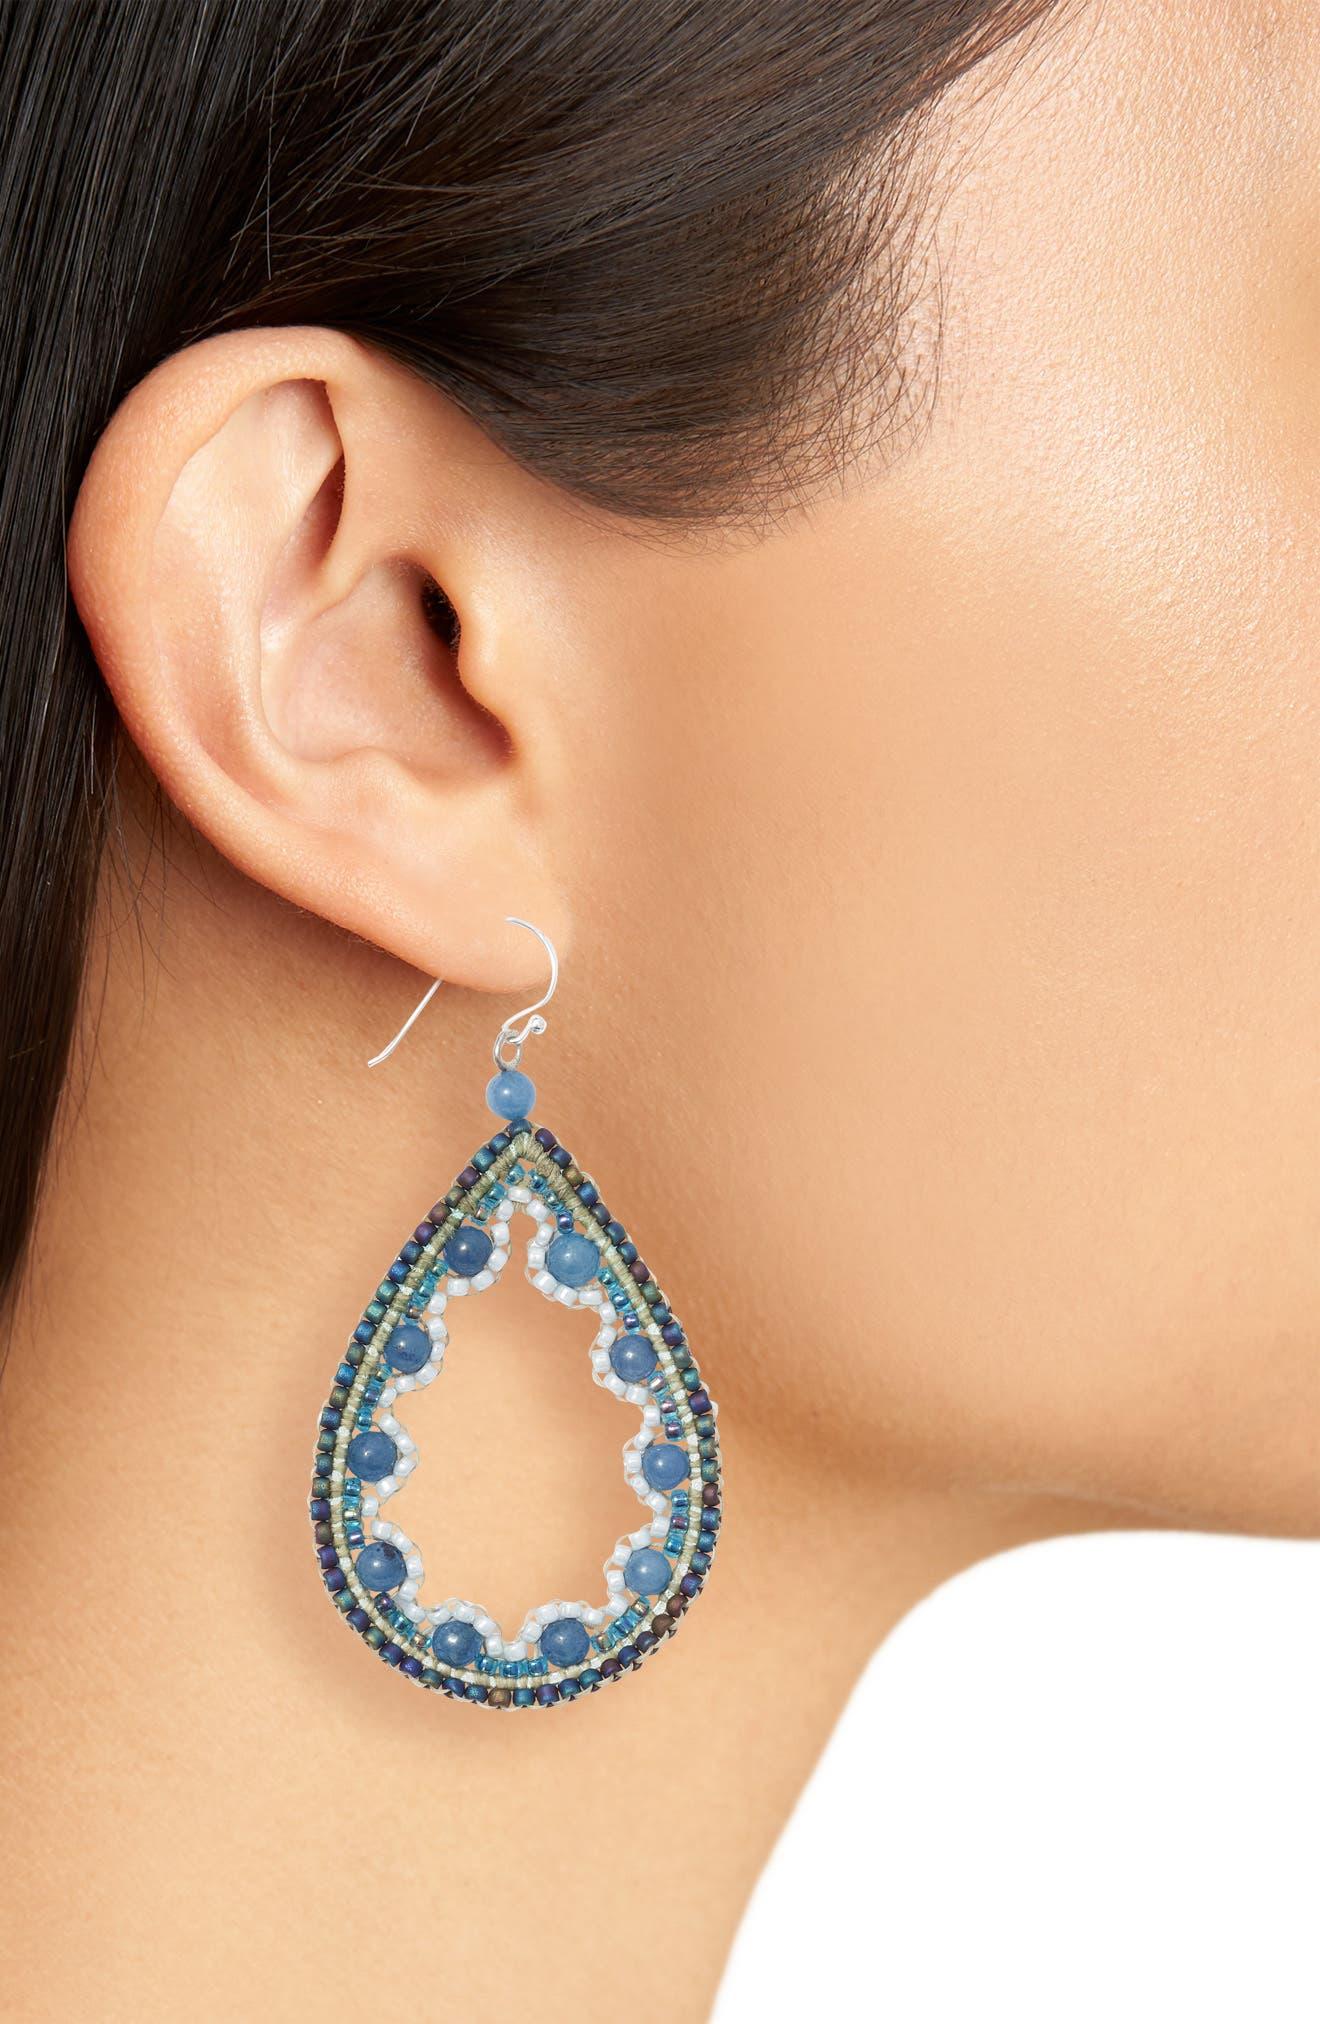 Beaded Agate Teardrop Earrings,                             Alternate thumbnail 4, color,